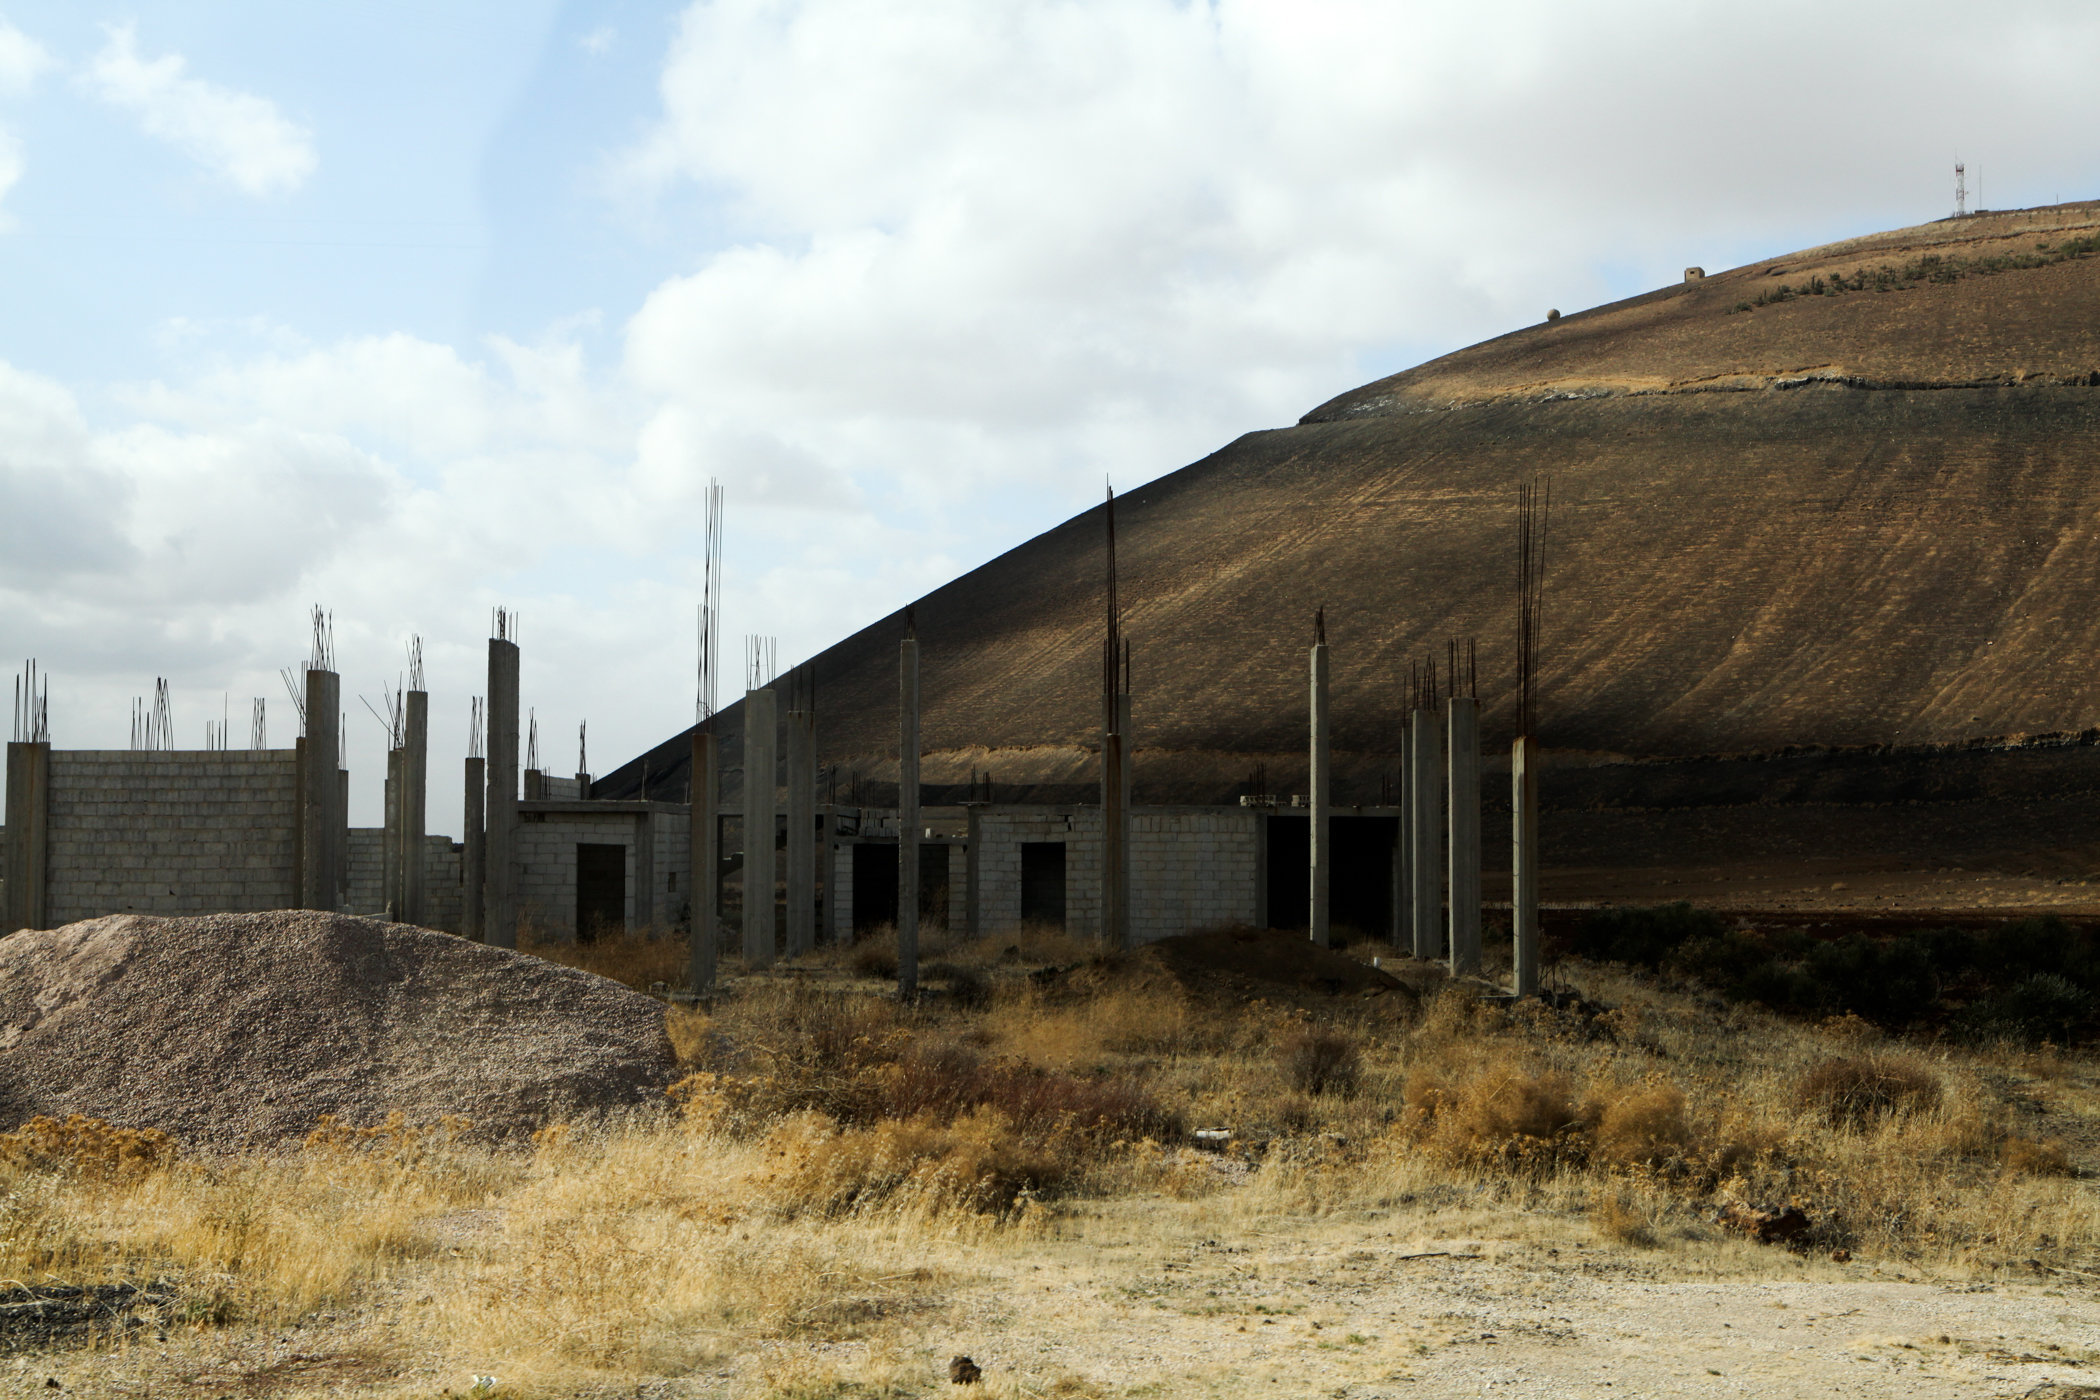 syria2011-0957-编辑.jpg